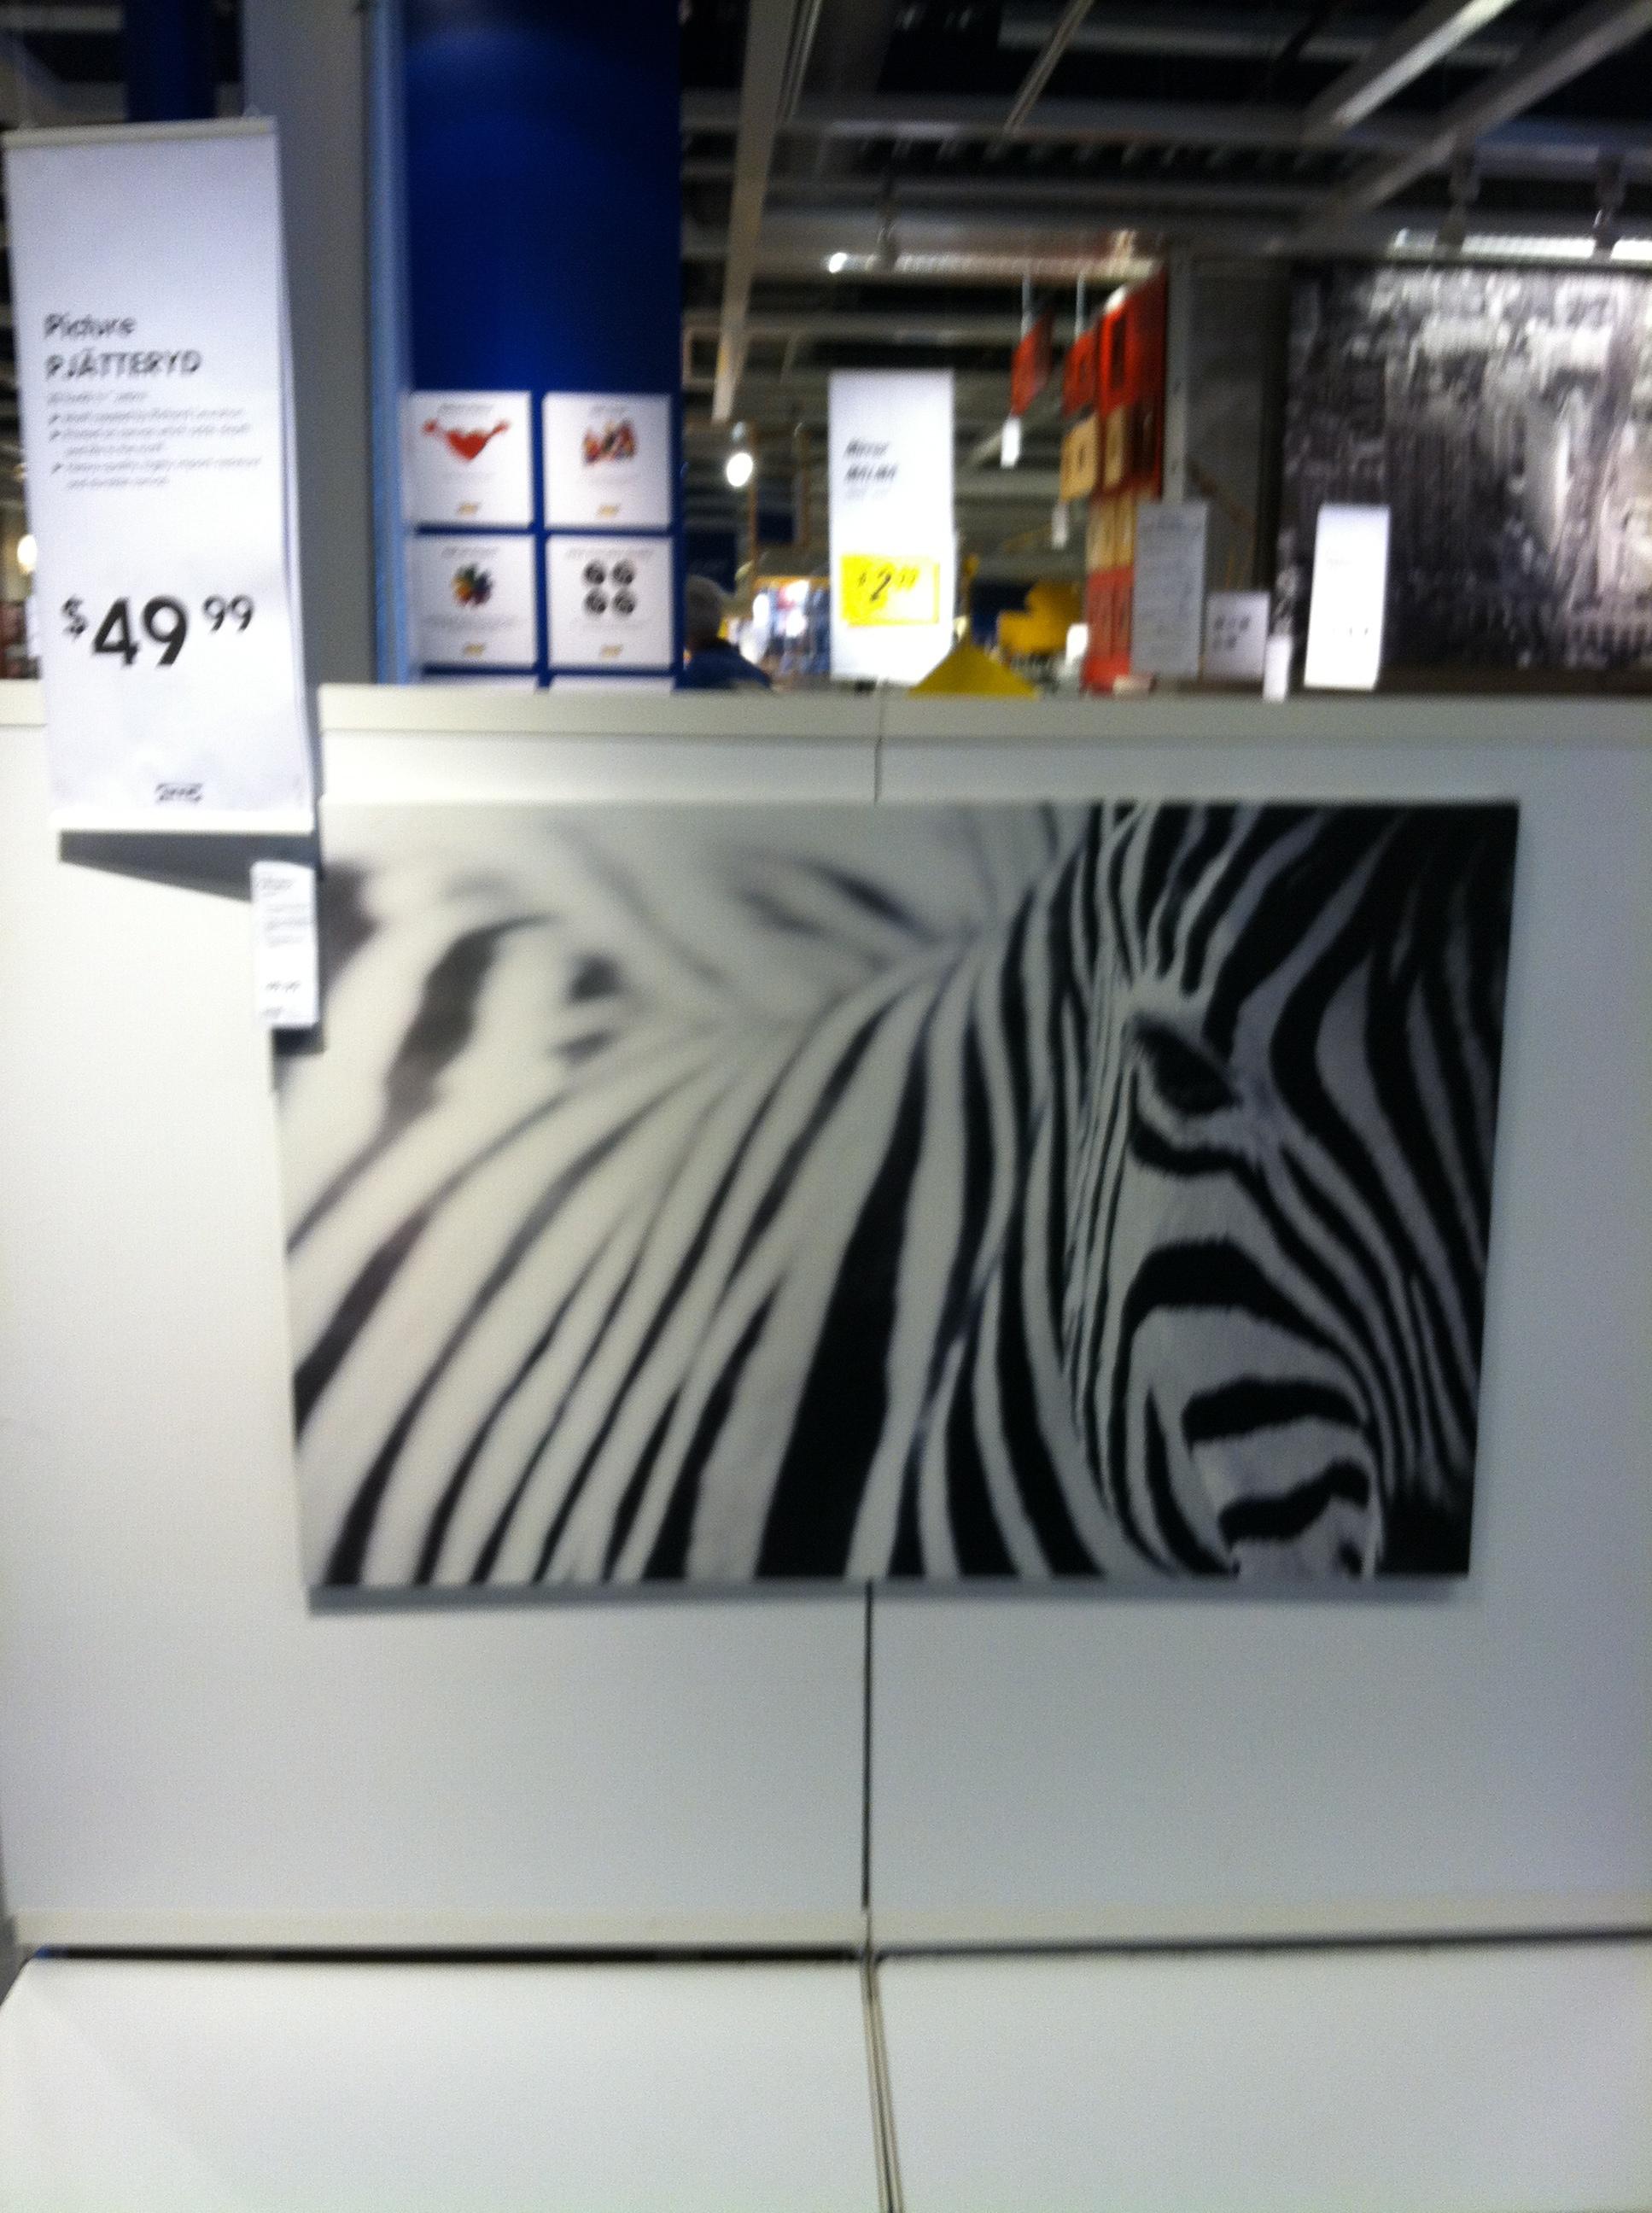 Zebra Painting Ikea Images Galleries